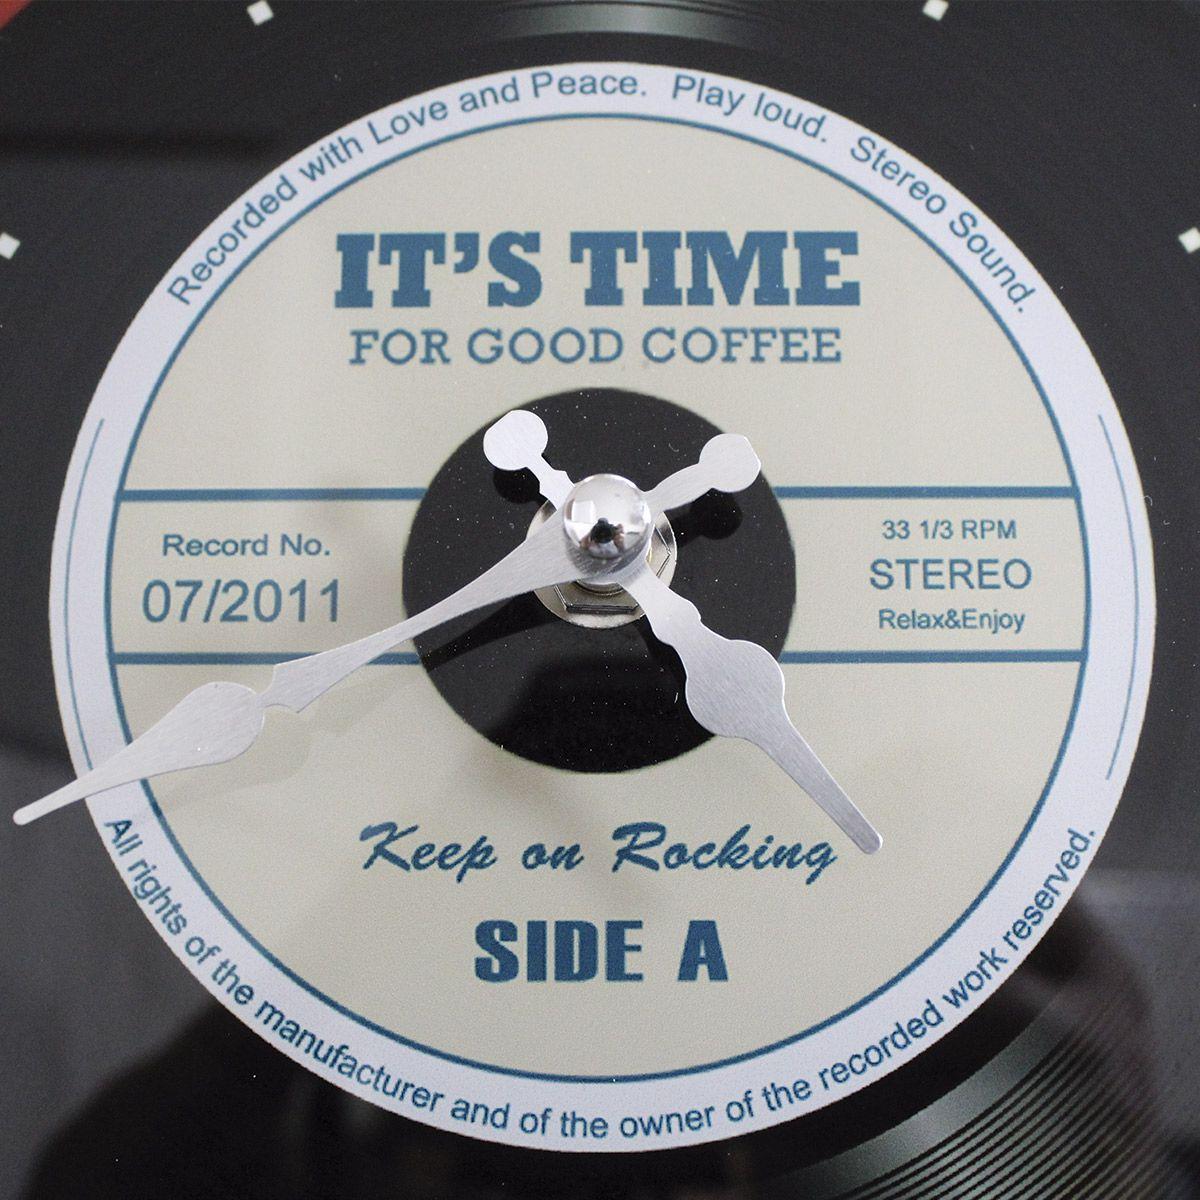 Relógio de Parede Retrô Mod LP Vinil Keep on Rocking - Red 20x20cm